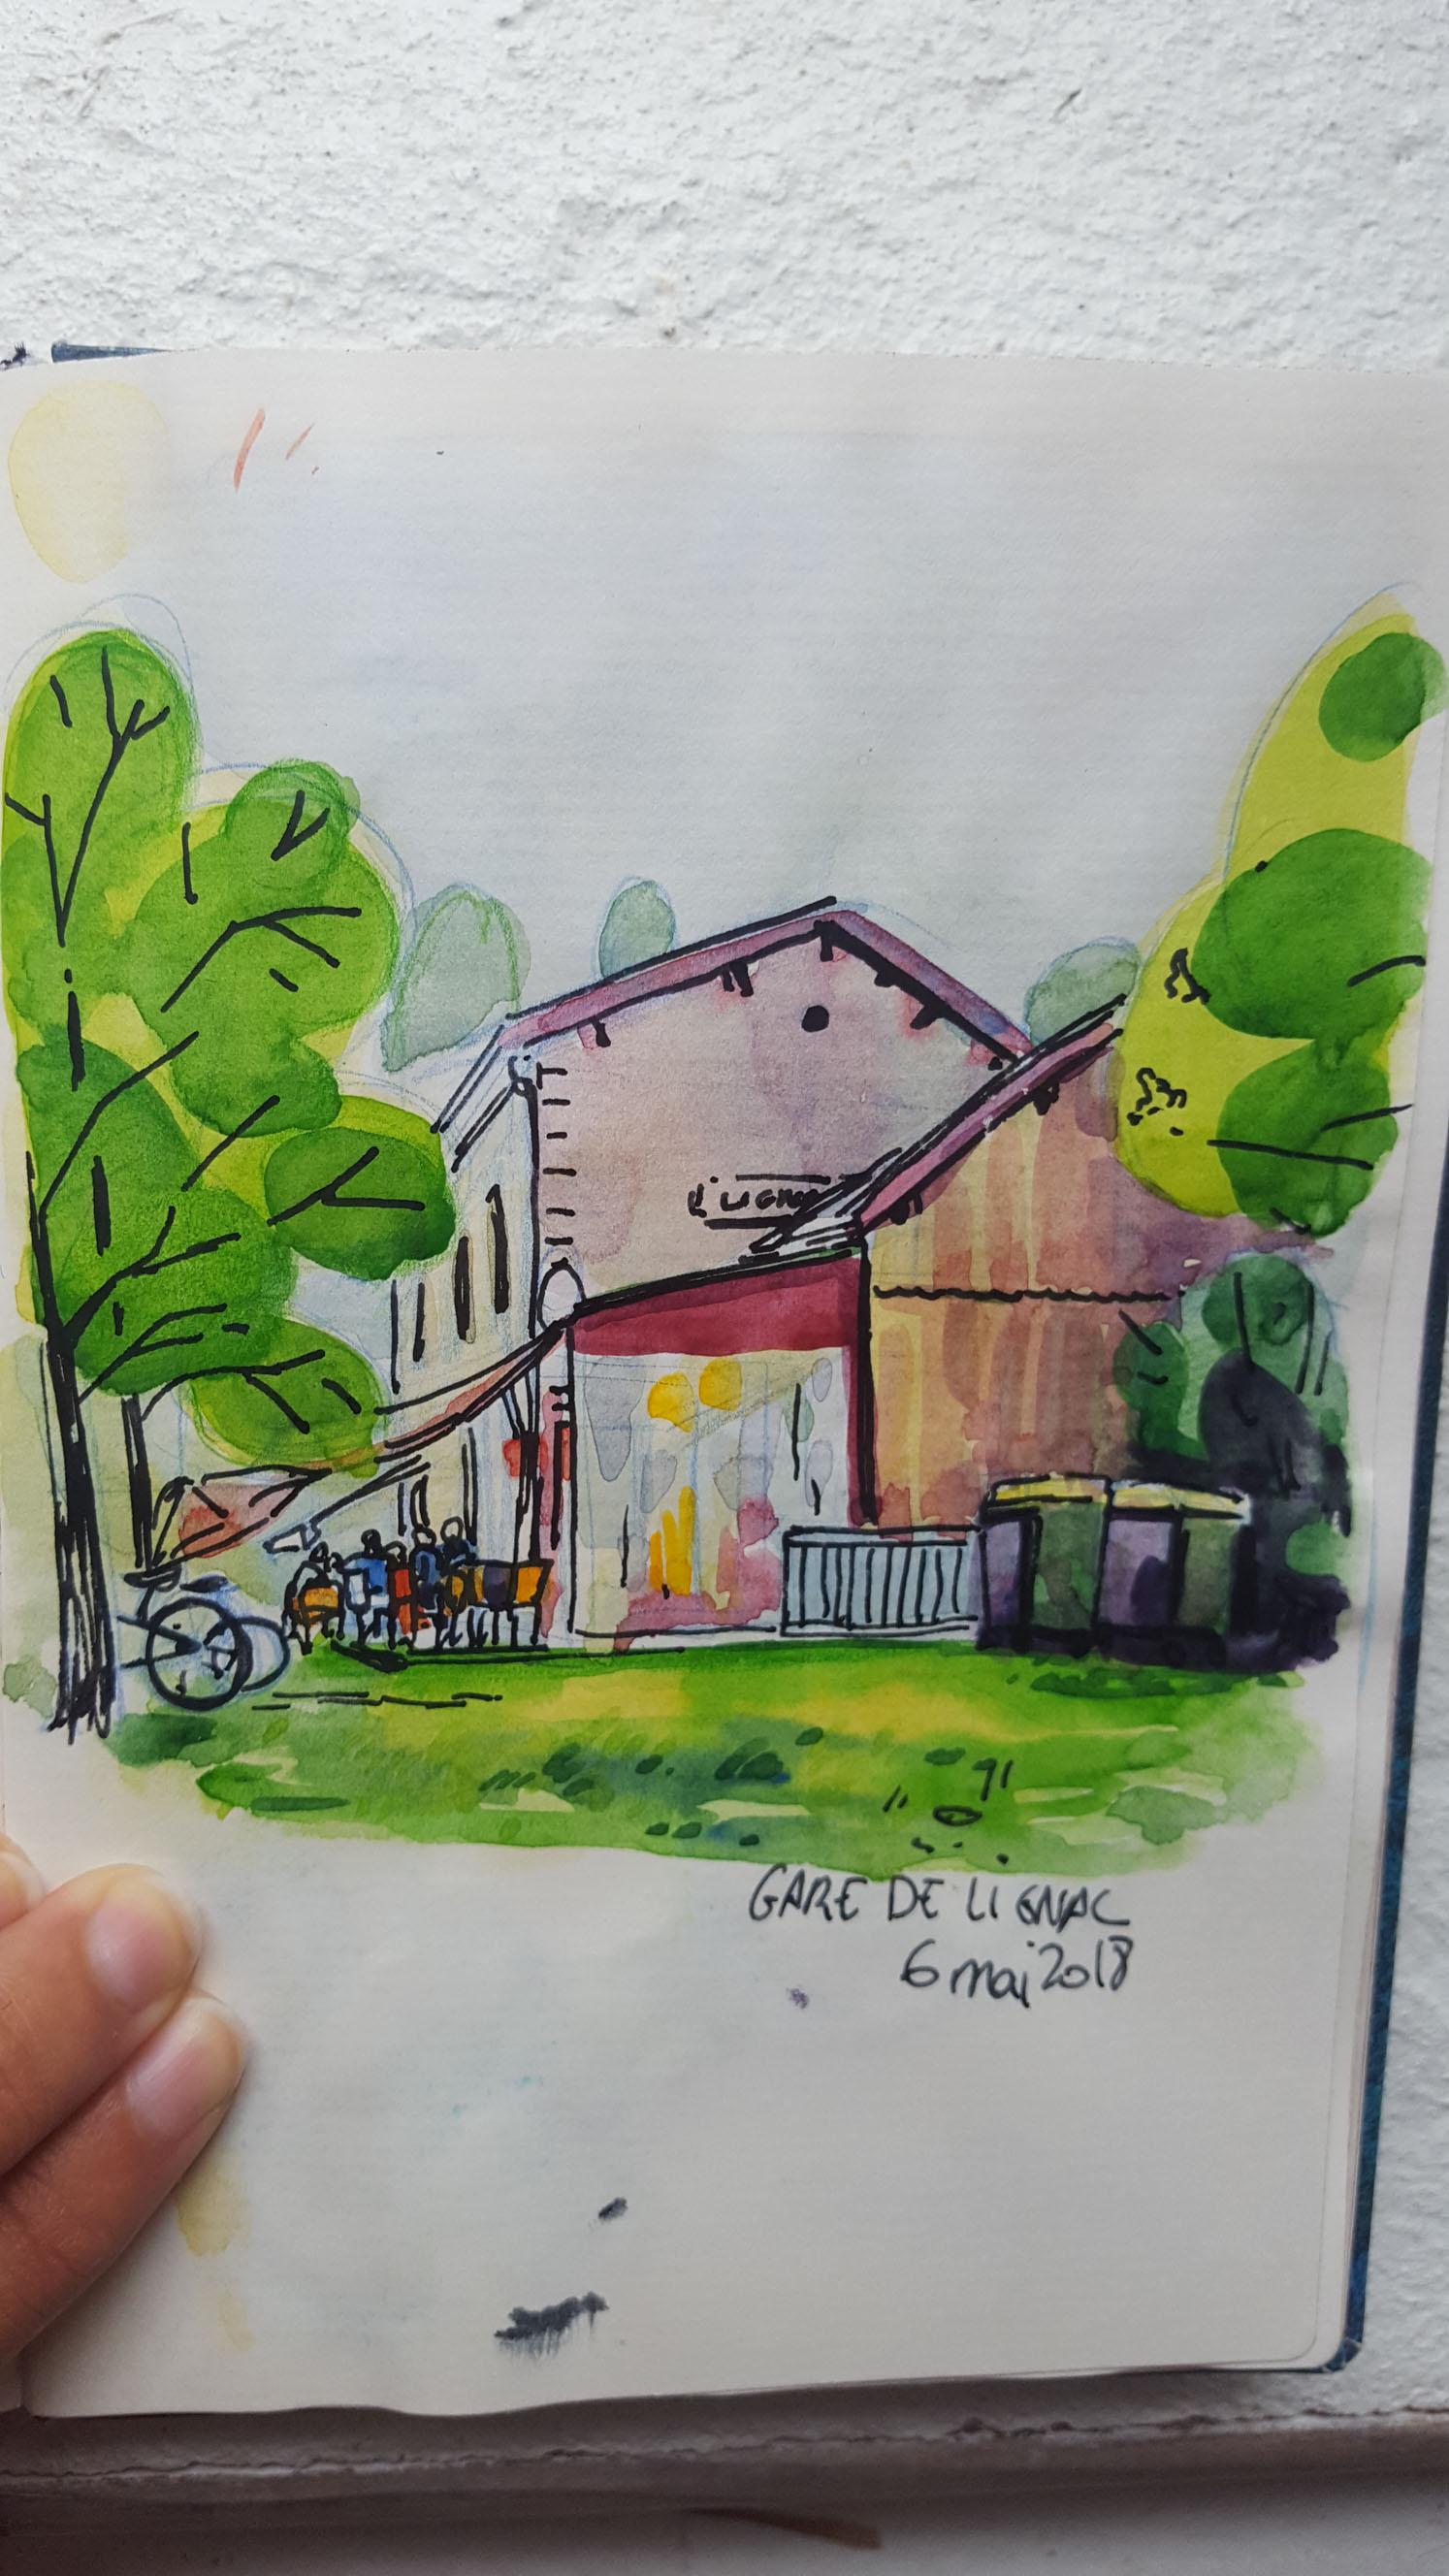 Sketchbook : IsaArne [ Challenge de l'ete P7 ] - Page 5 Facecr41